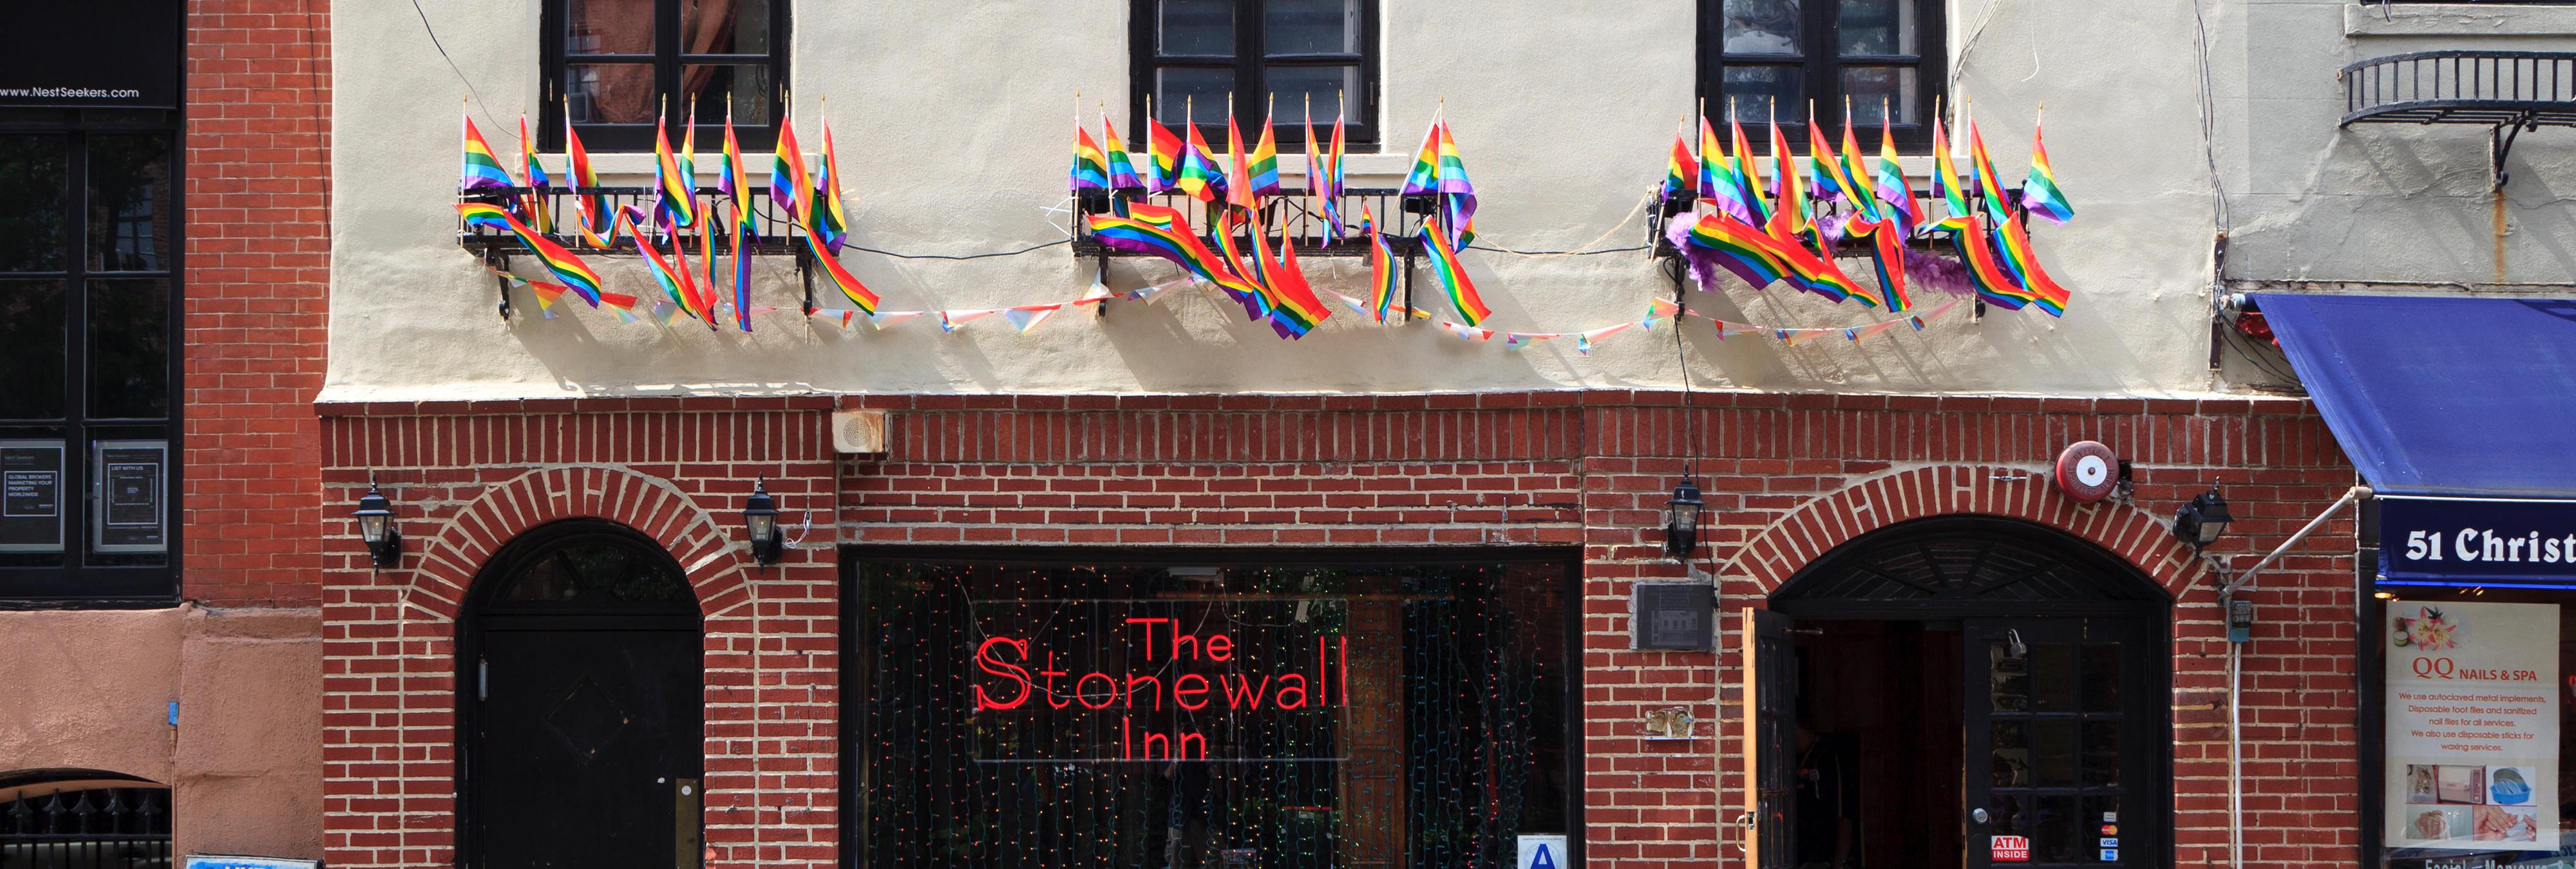 Hazte Oír lleva el autobús transfóbico a Stonewall